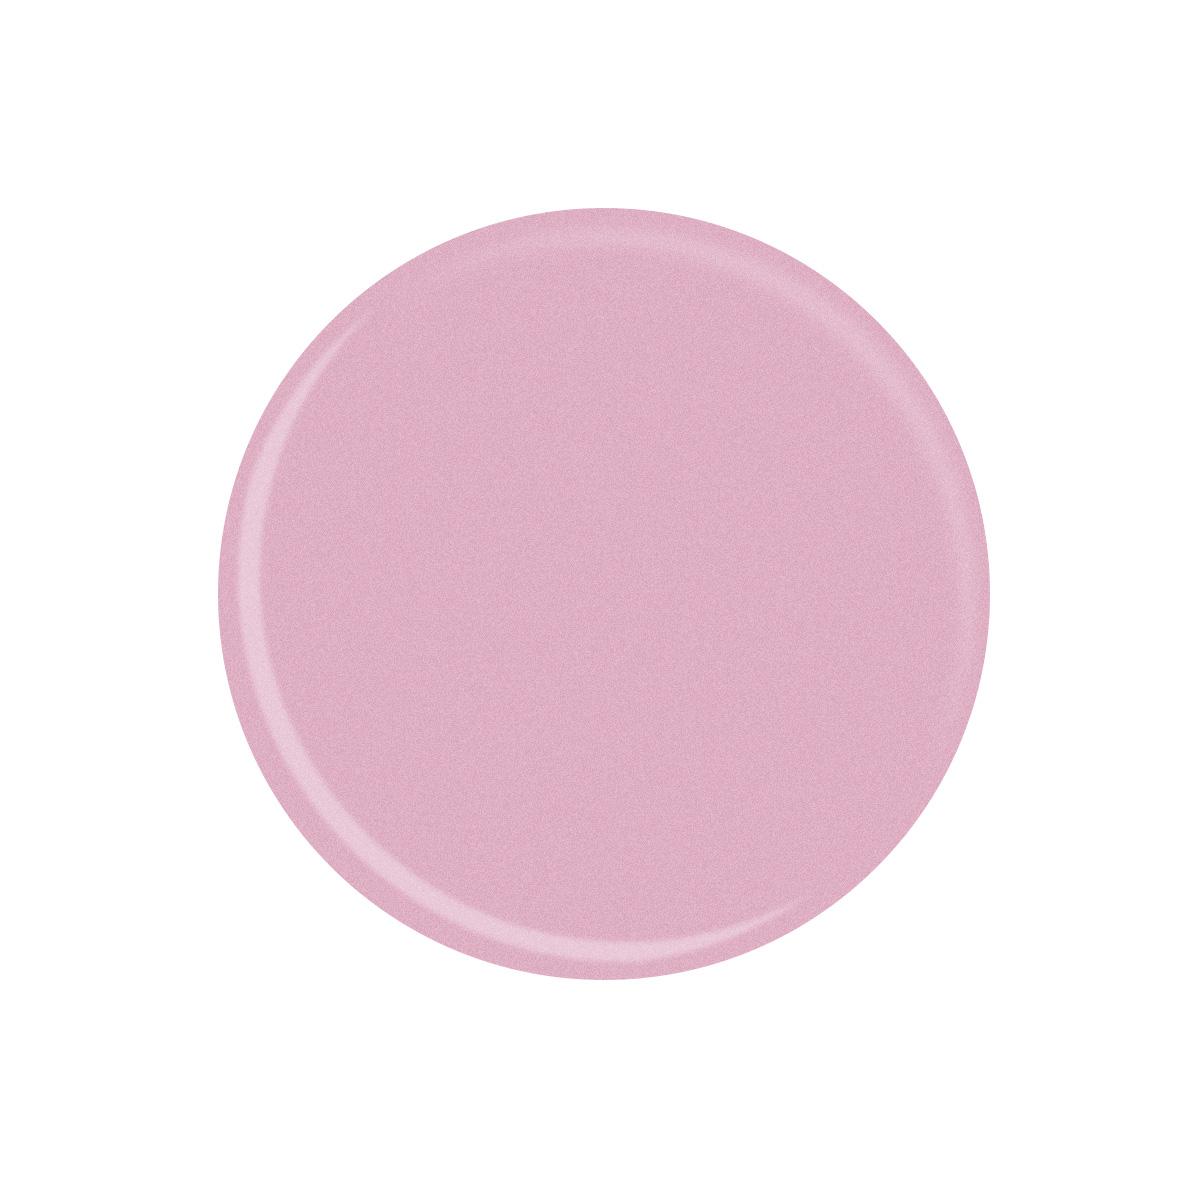 JESSICA Nail Colour Pinkies Up